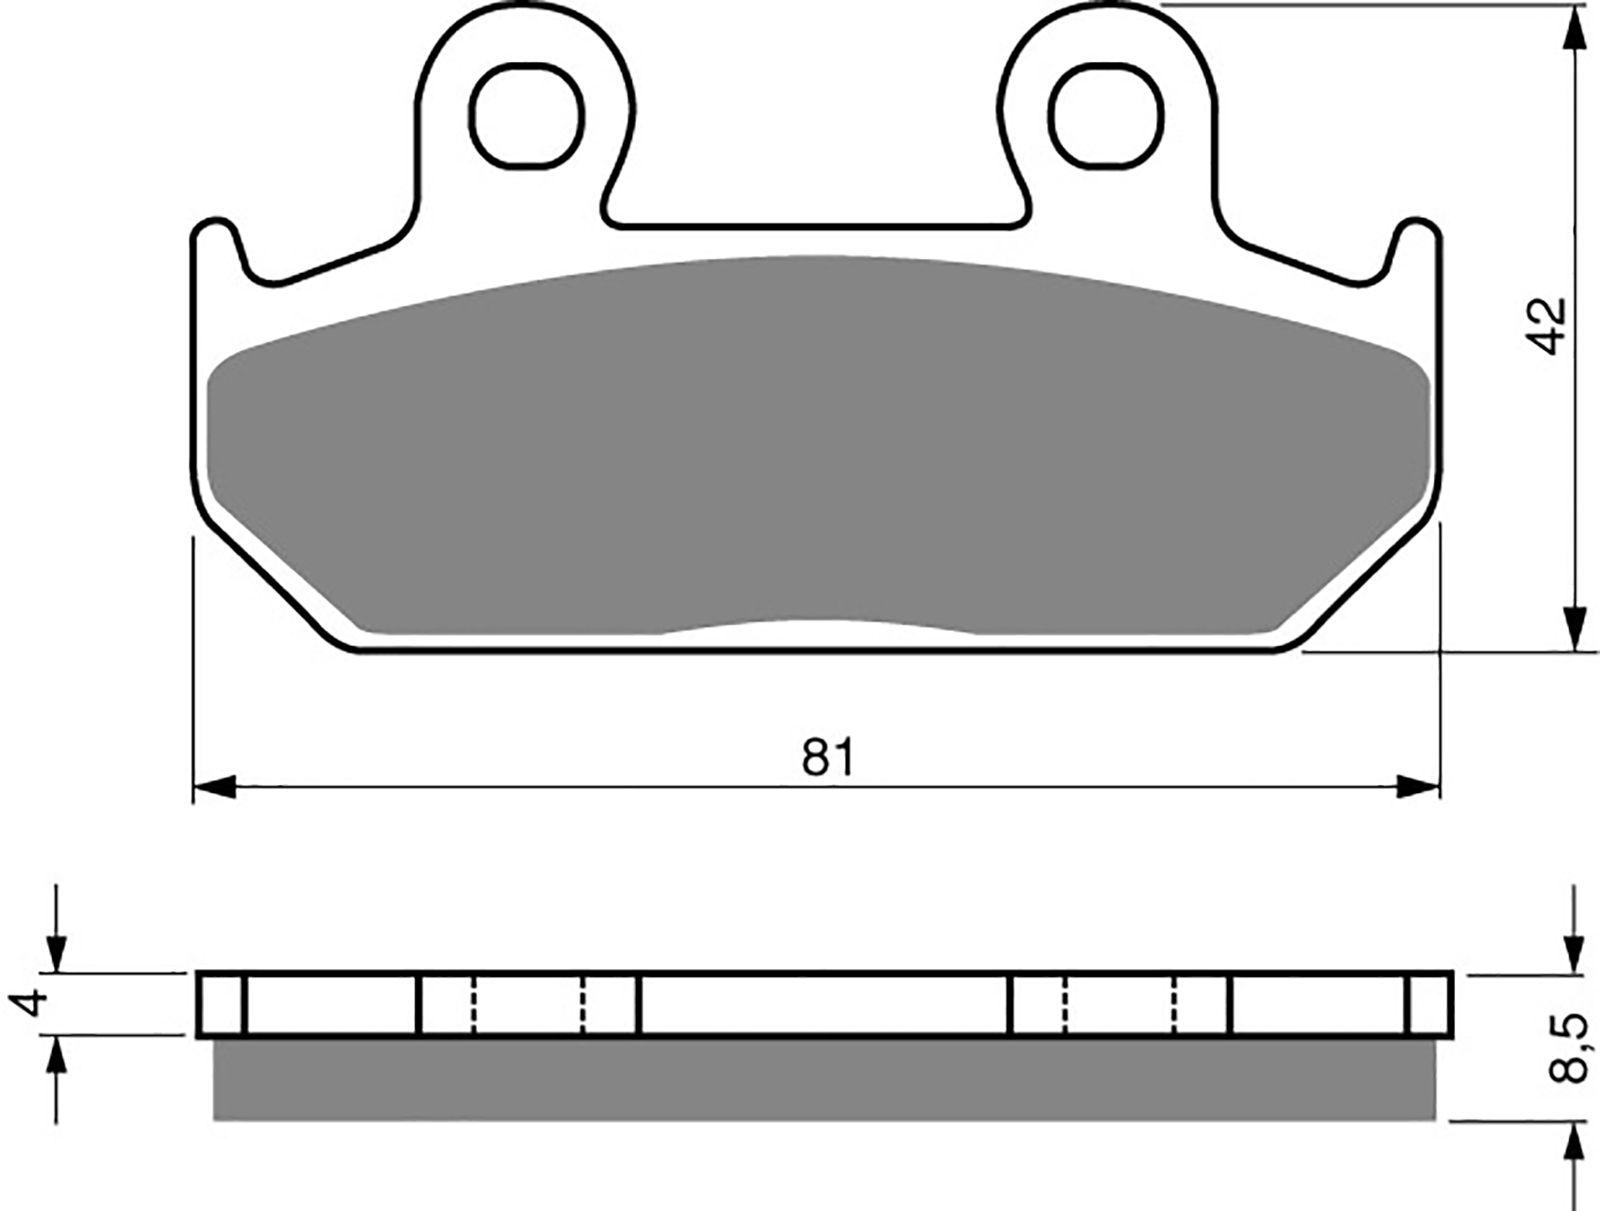 goldfren s33 brake pads - 700025GS image